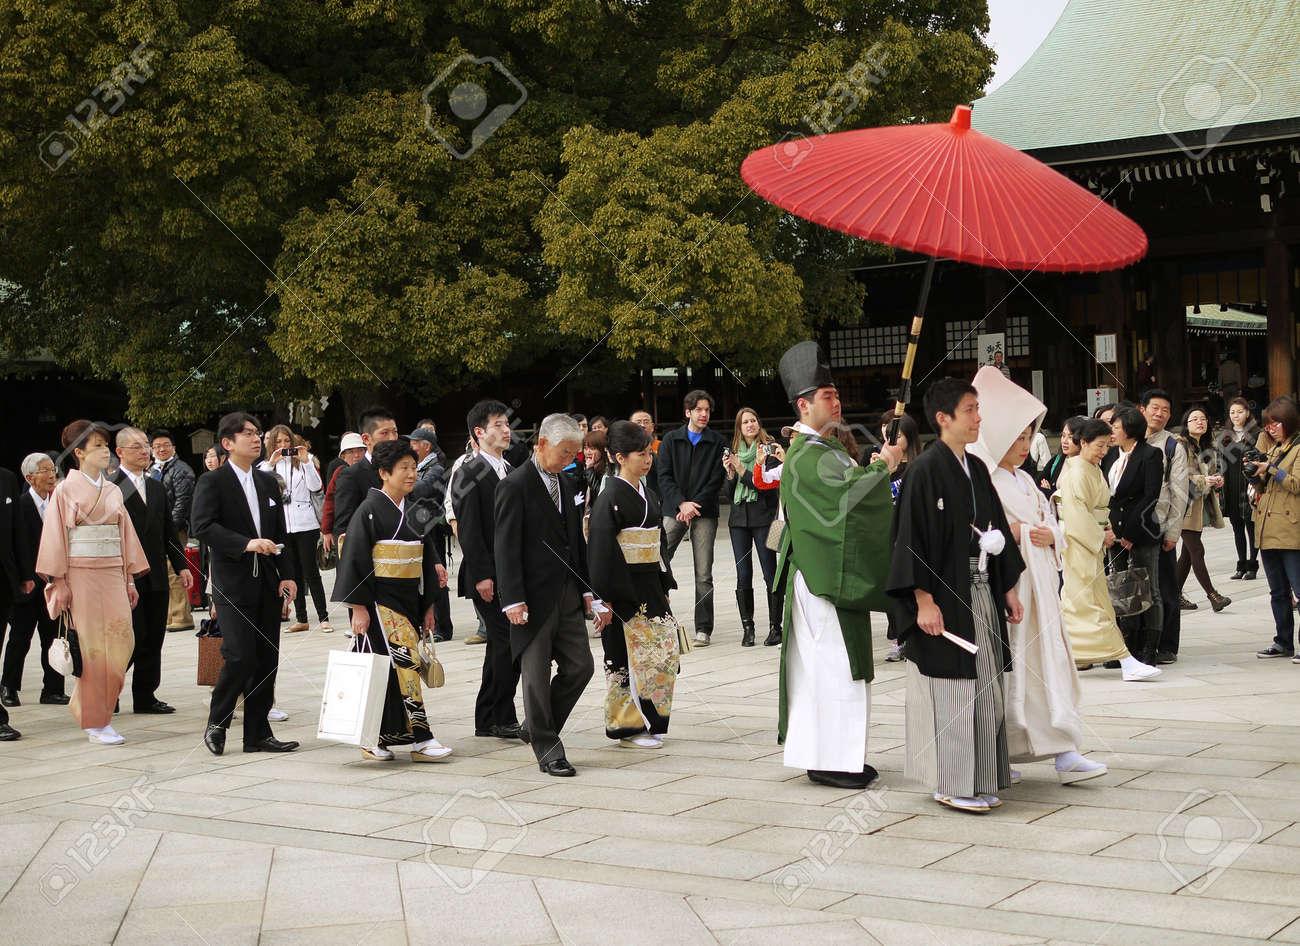 HARAJUKU,TOKYO - MARCH 25, 2012: Celebration of a typical wedding ceremony in Meiji Jingu Shrine Harajuku Tokyo, Japan. Stock Photo - 17262309